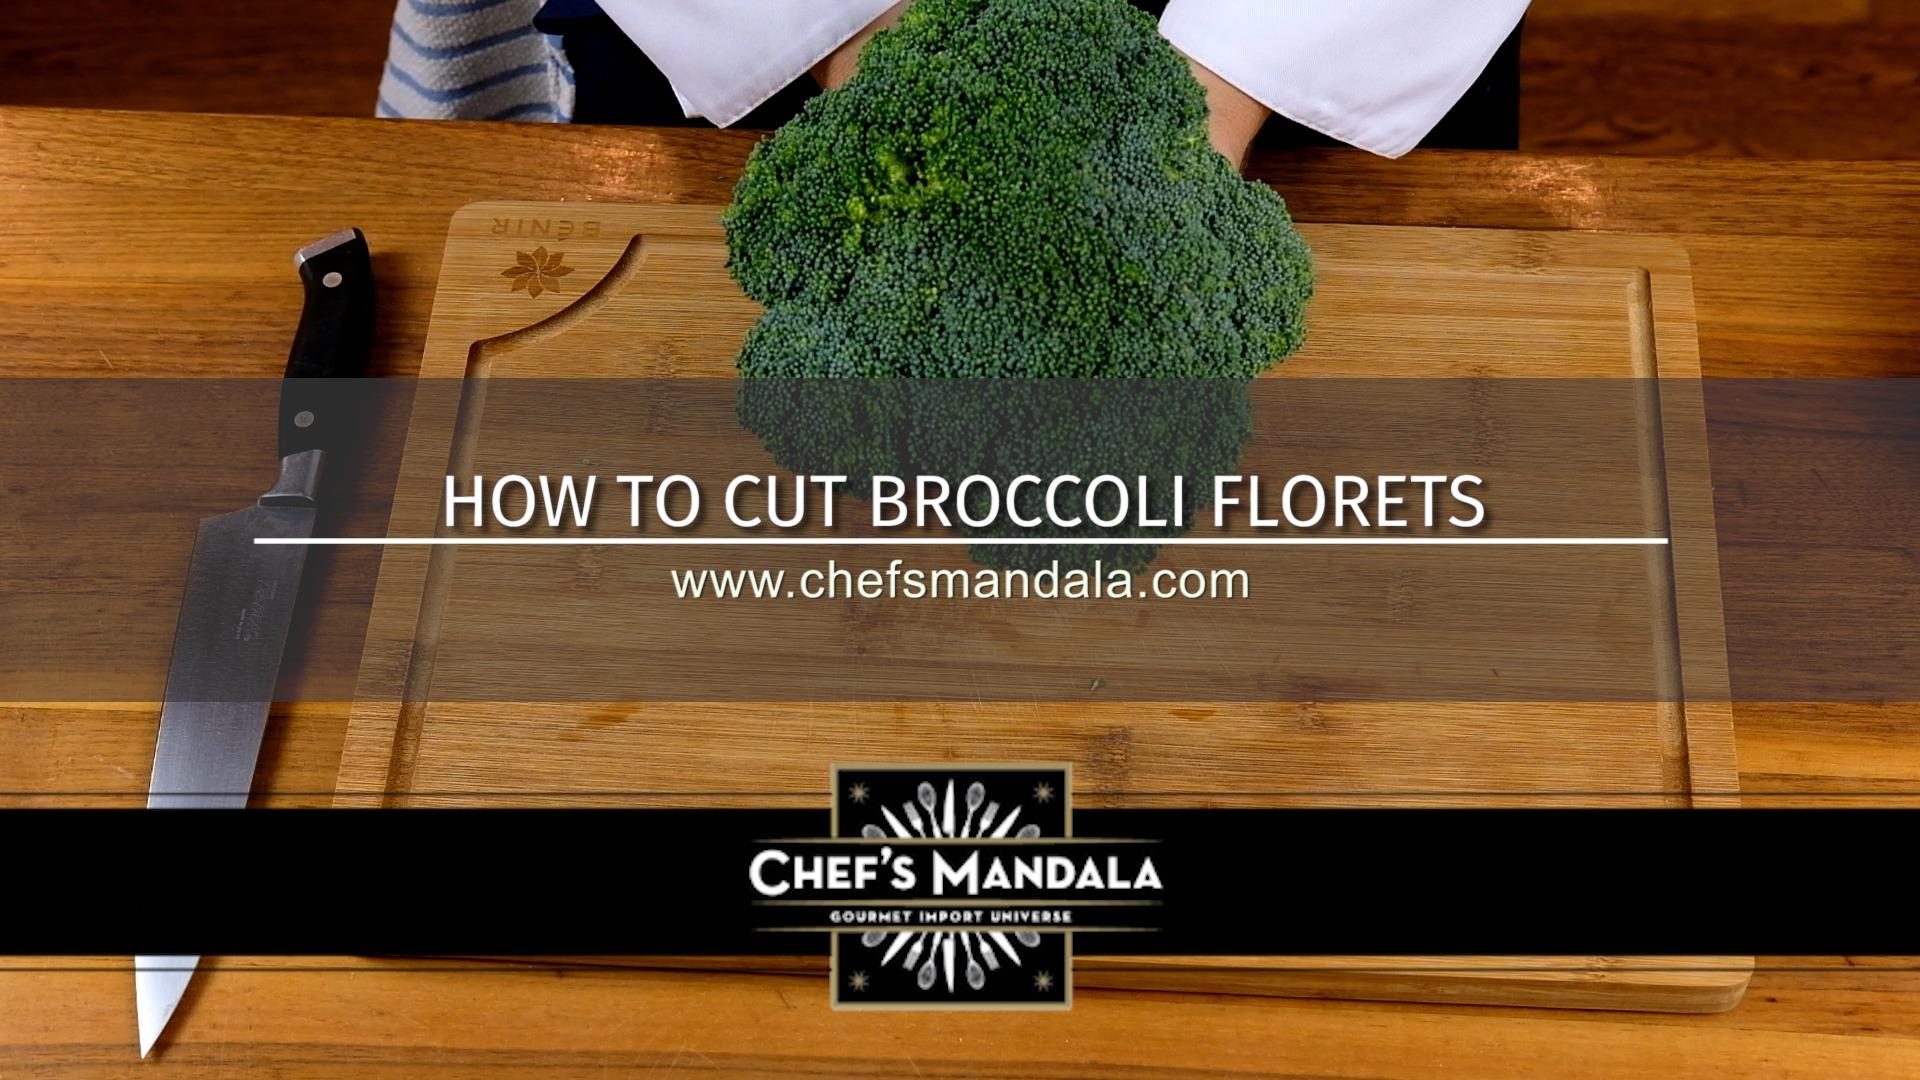 HOW TO CUT BROCCOLI FLORETS